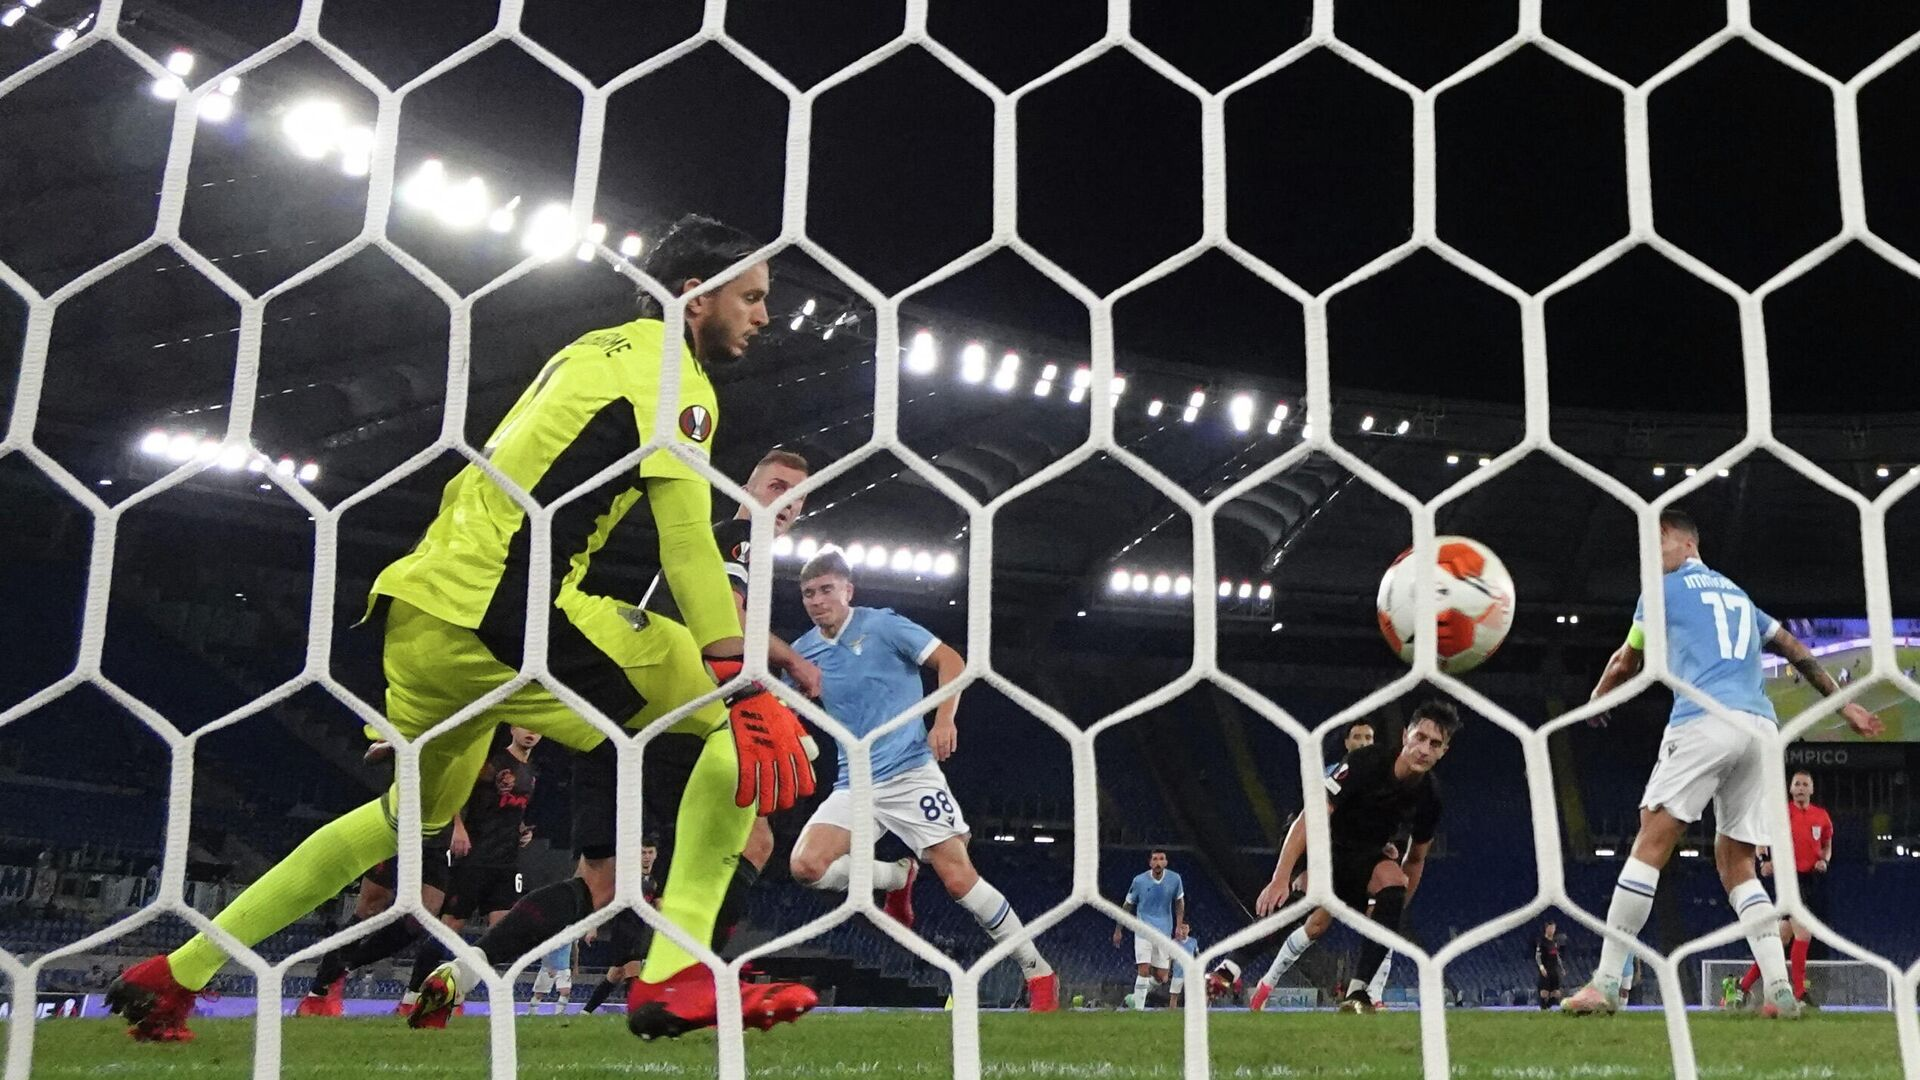 Лацио забивает гол в ворота Локомотива - РИА Новости, 1920, 01.10.2021